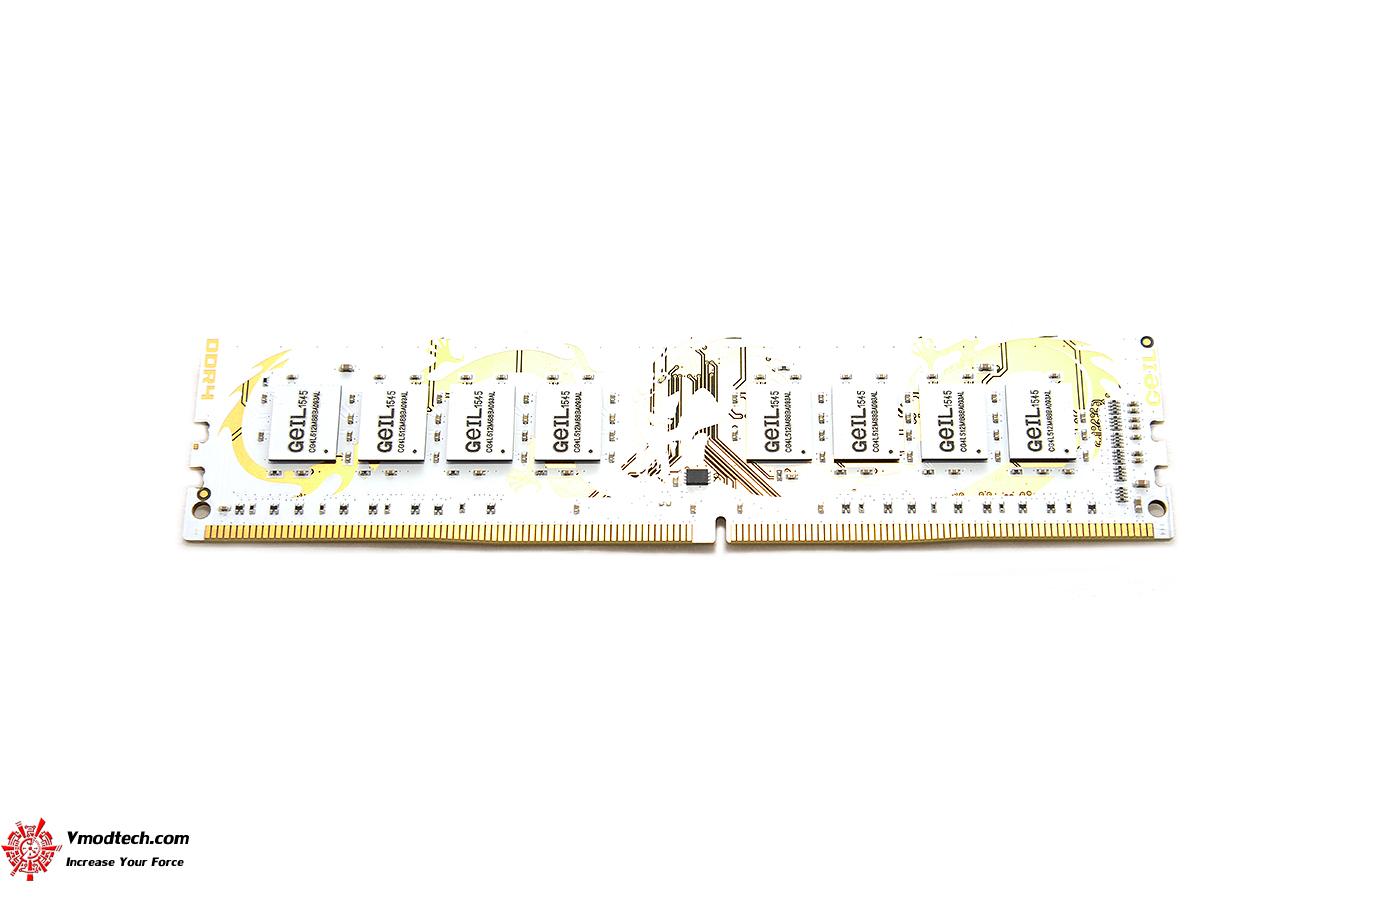 dsc 3617 GEIL DDR4 Dragon RAM 3000Mhz 16GB REVIEW